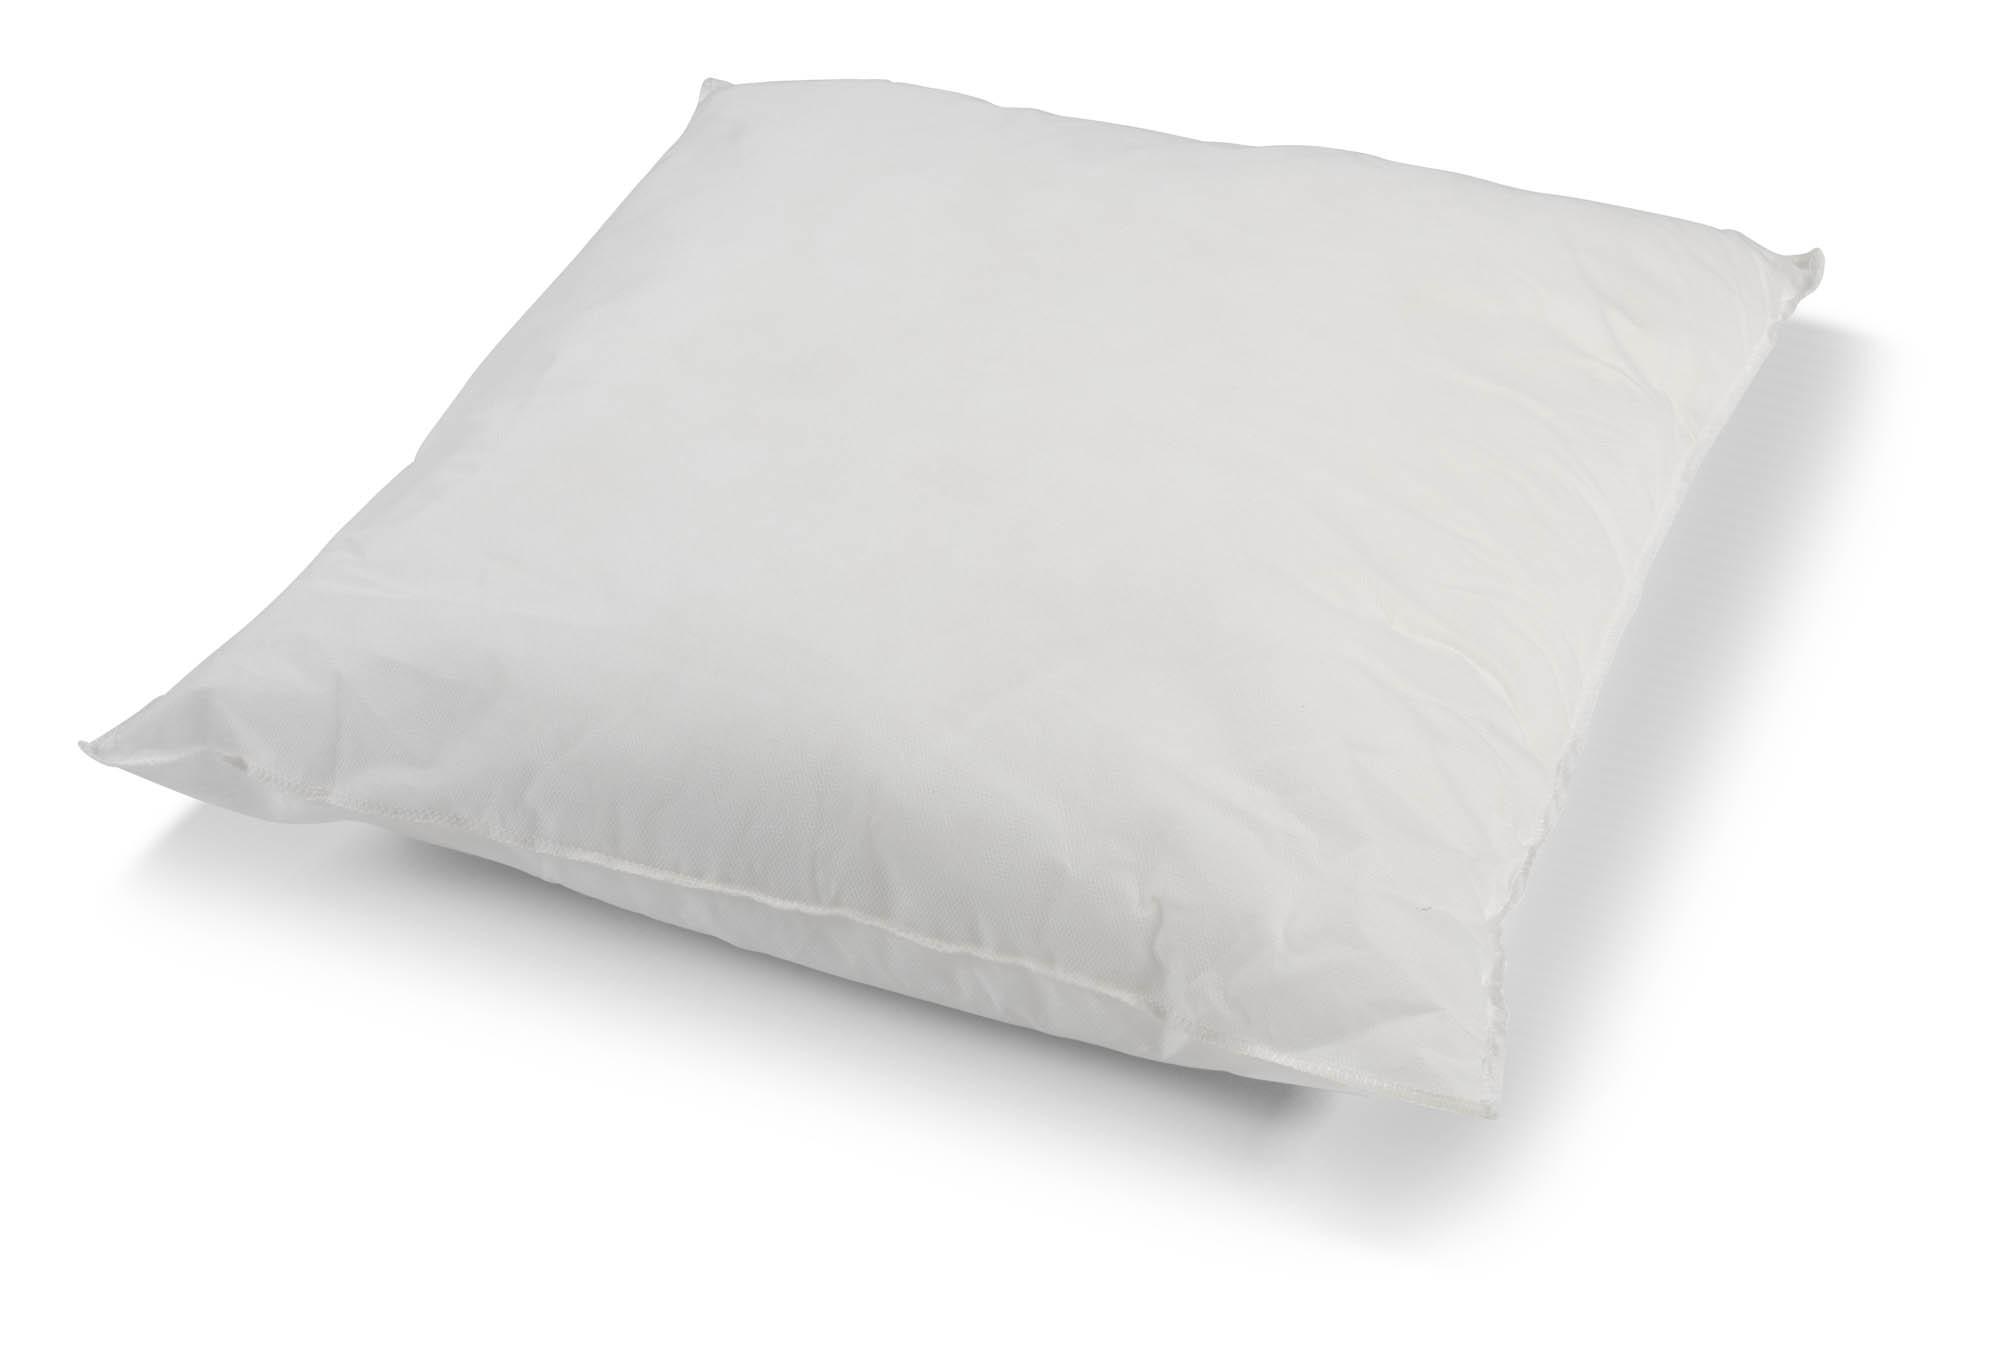 Binnenkussen 45x45 cm met polyester vulling 315 gram